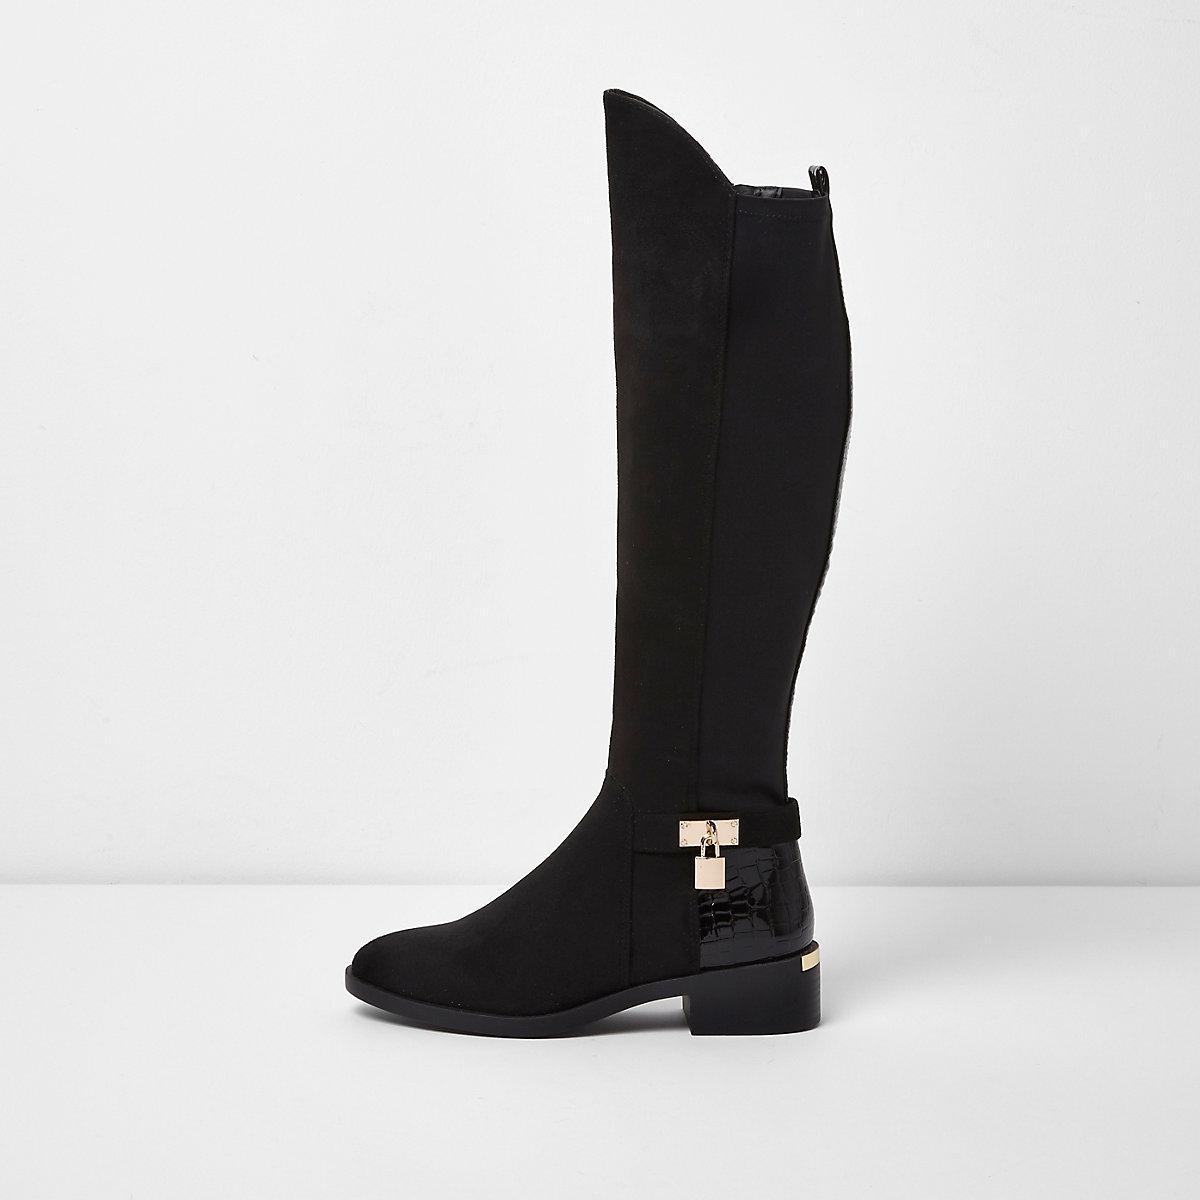 Black knee high riding boots